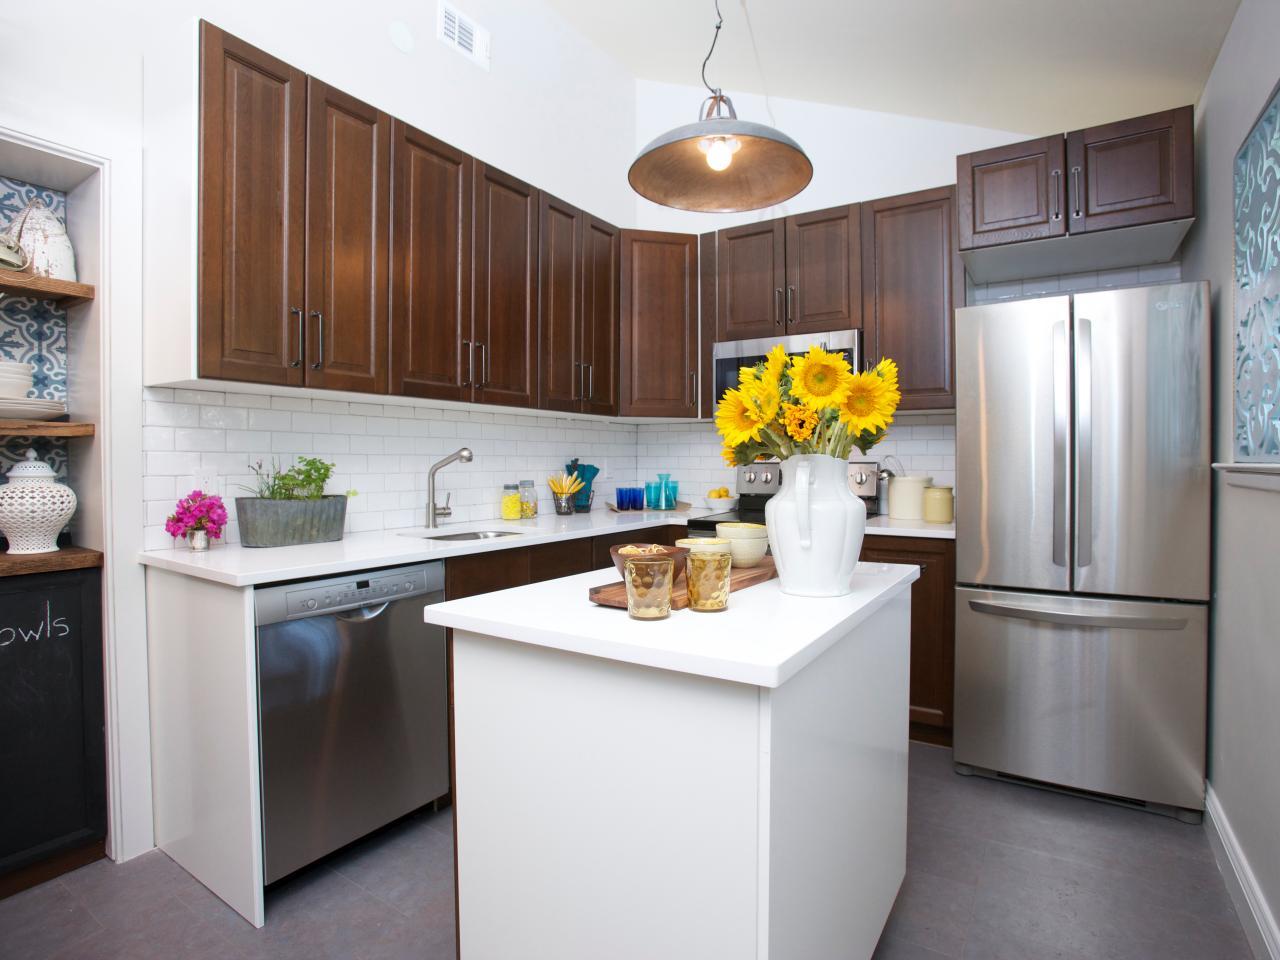 Best Kitchen Flooring Options Choose The Best Flooring For Your Kitchen Hgtv